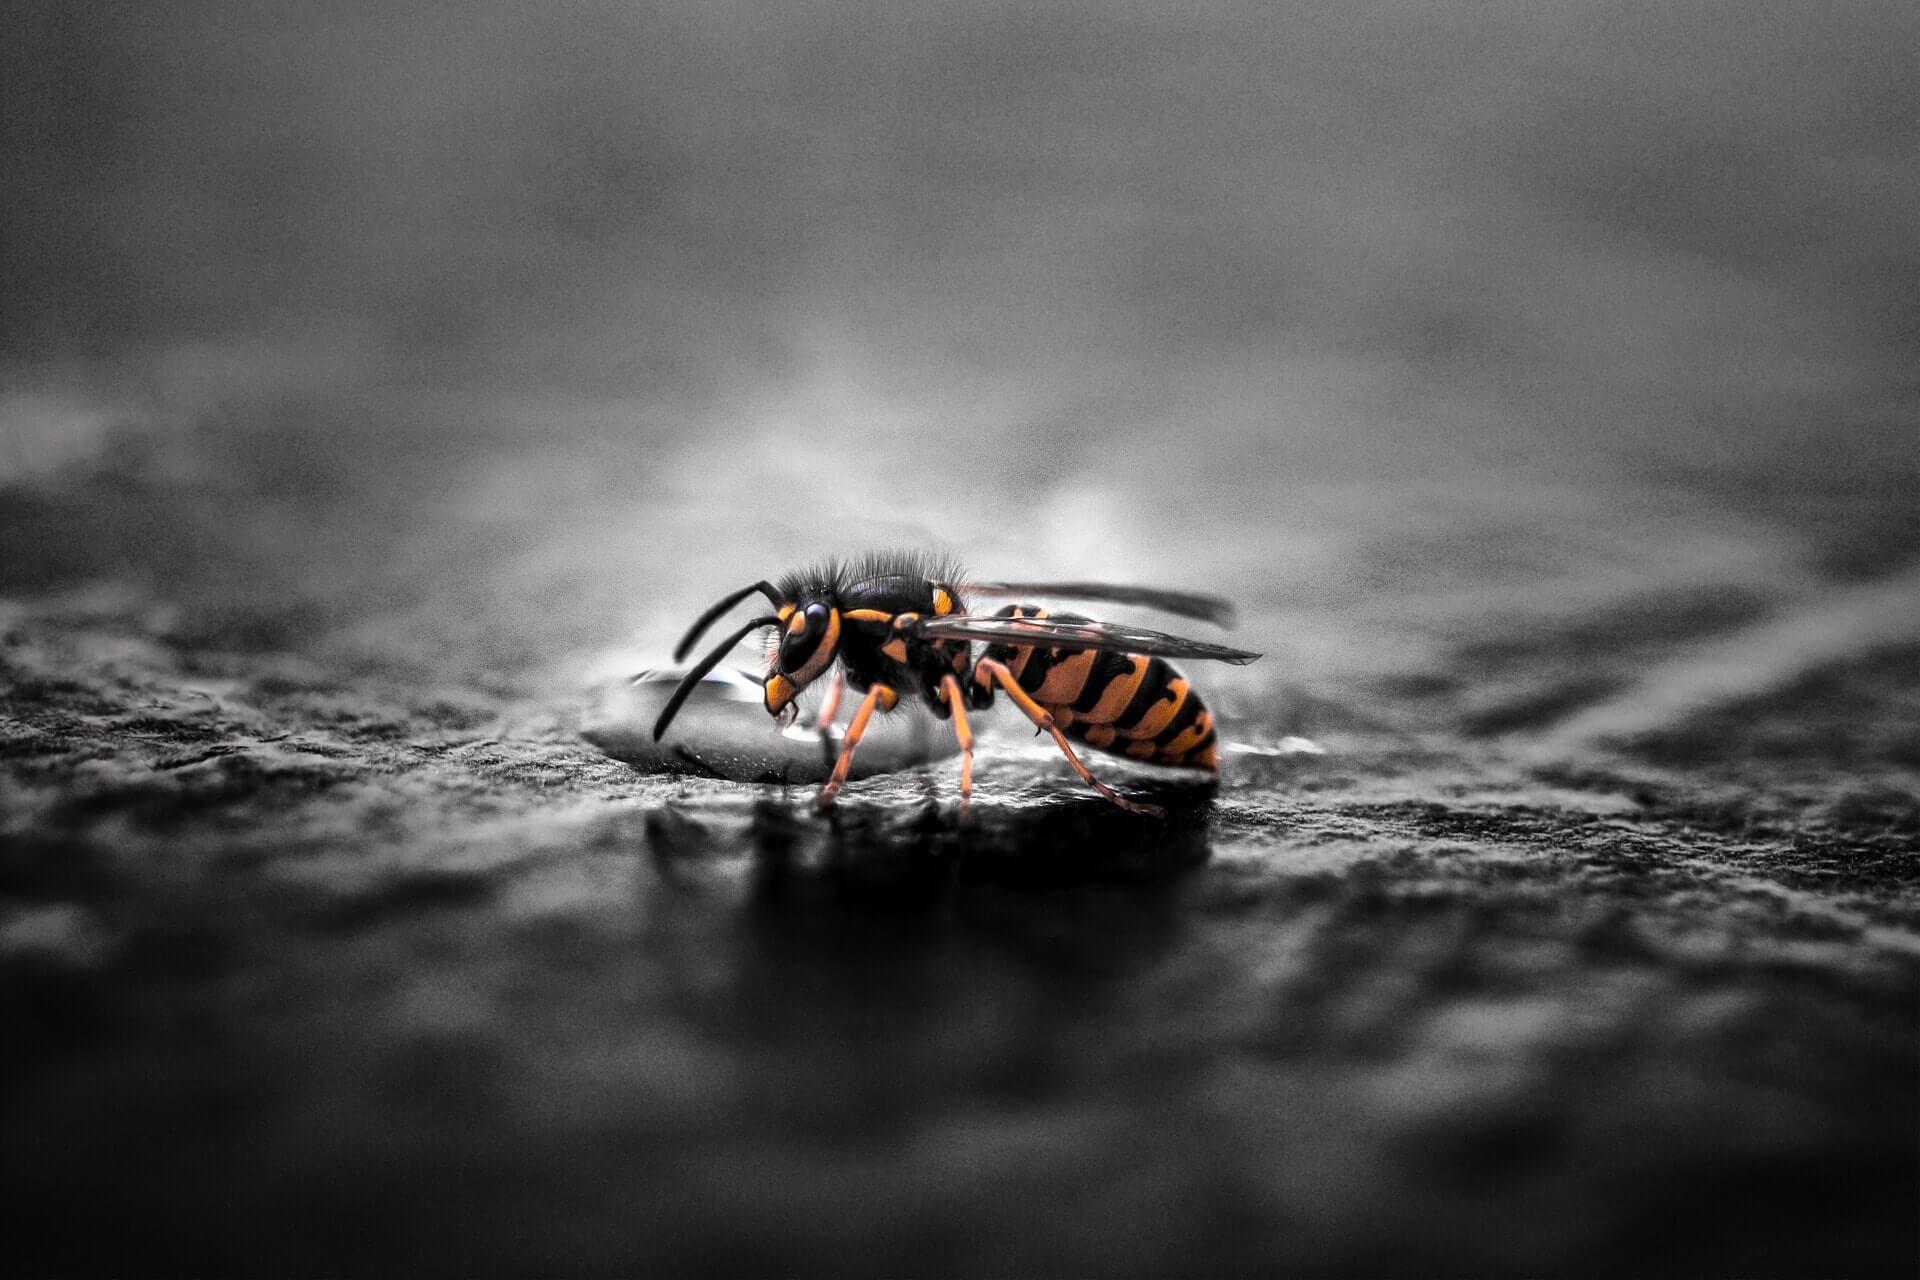 wespen im winter wie berwintern die insekten wespen. Black Bedroom Furniture Sets. Home Design Ideas